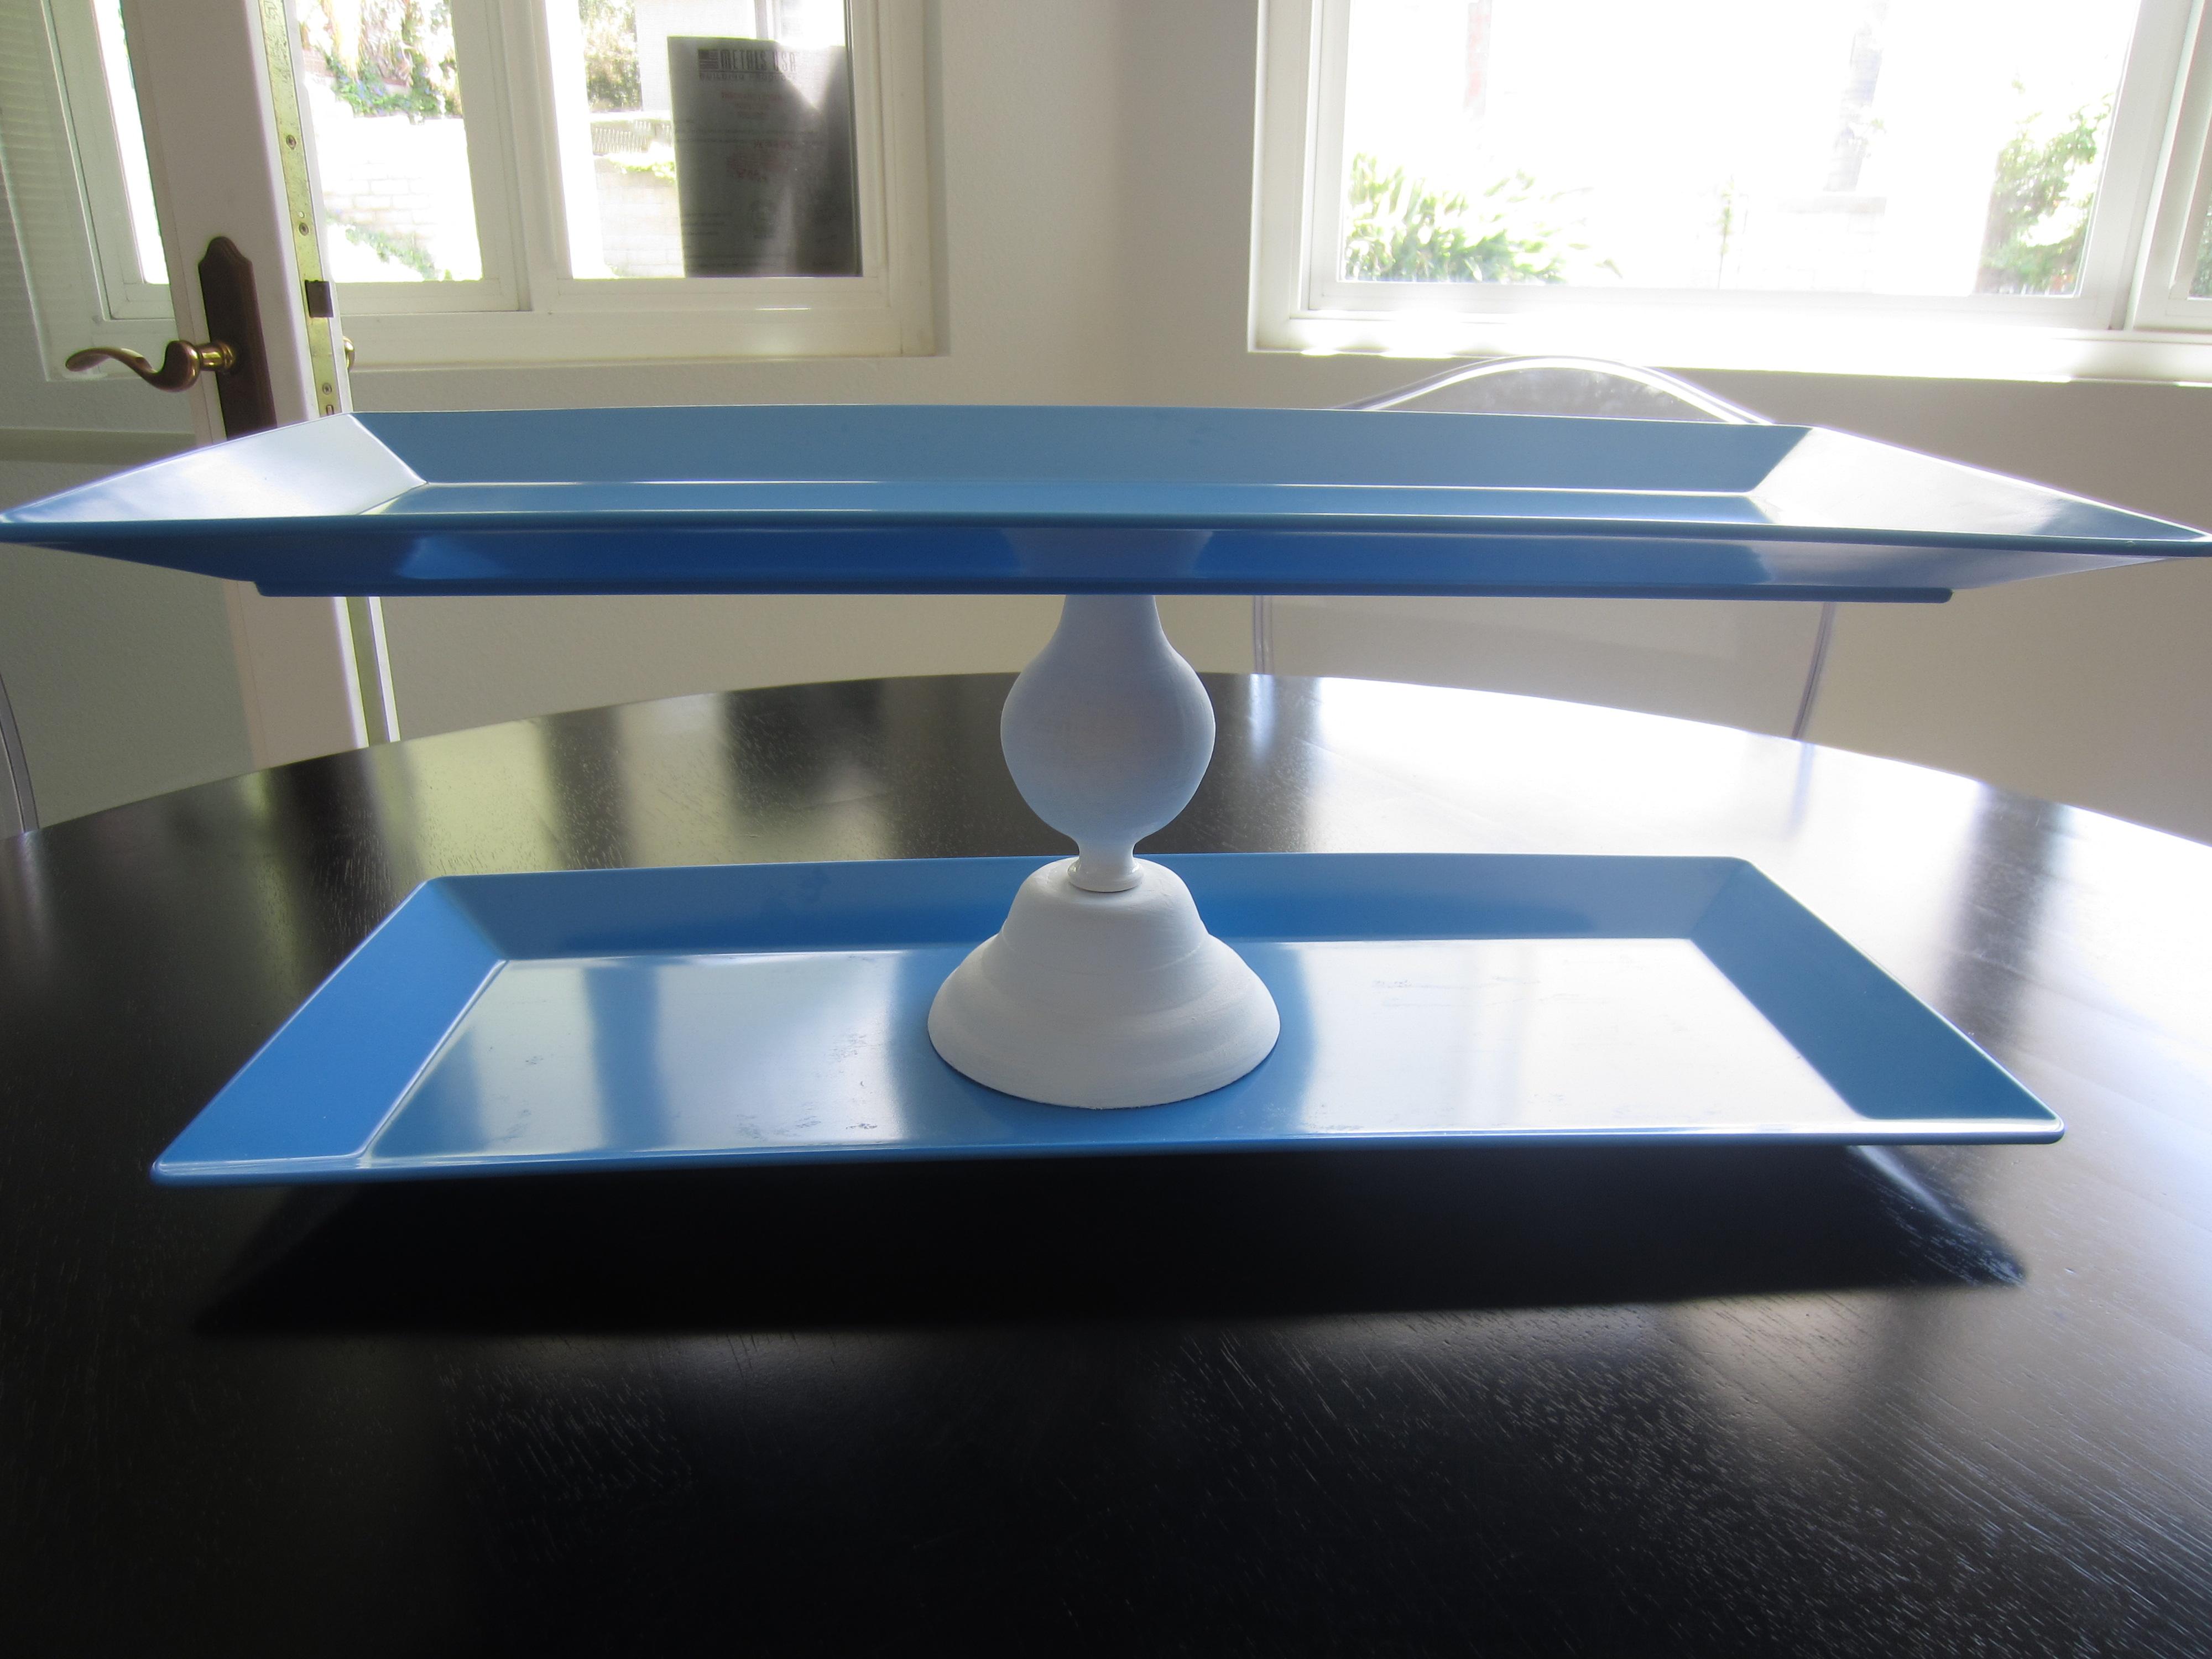 DIY Cupcake Stand - DIY Inspired